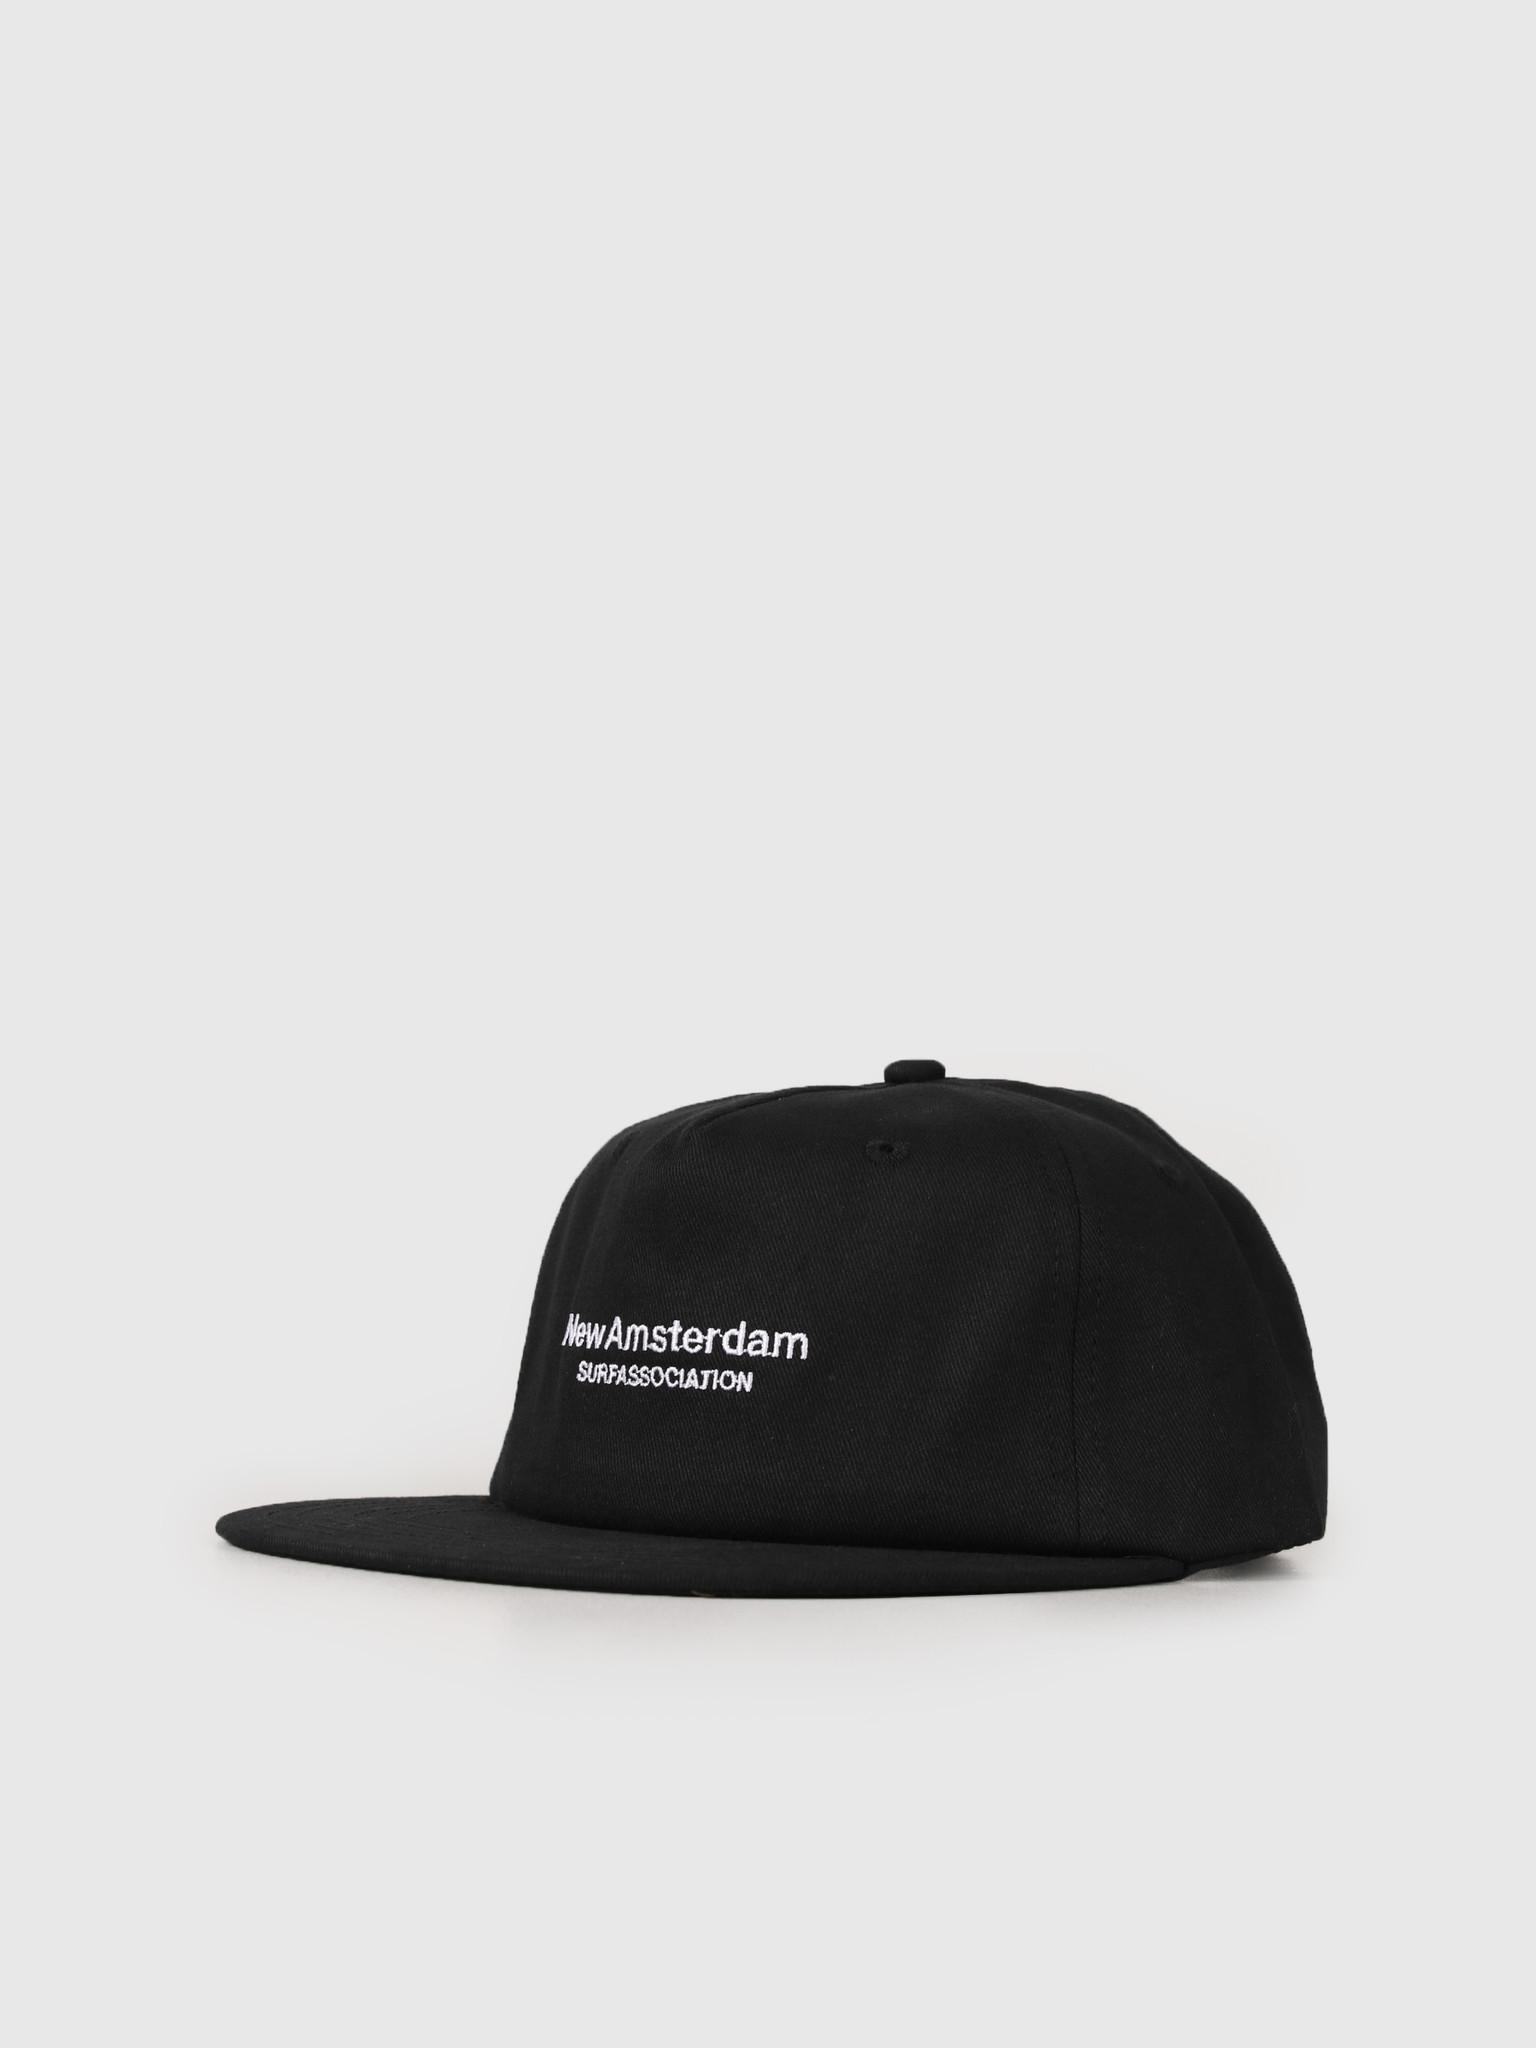 New Amsterdam Surf association New Amsterdam Surf association Logo Cap Black 2018022